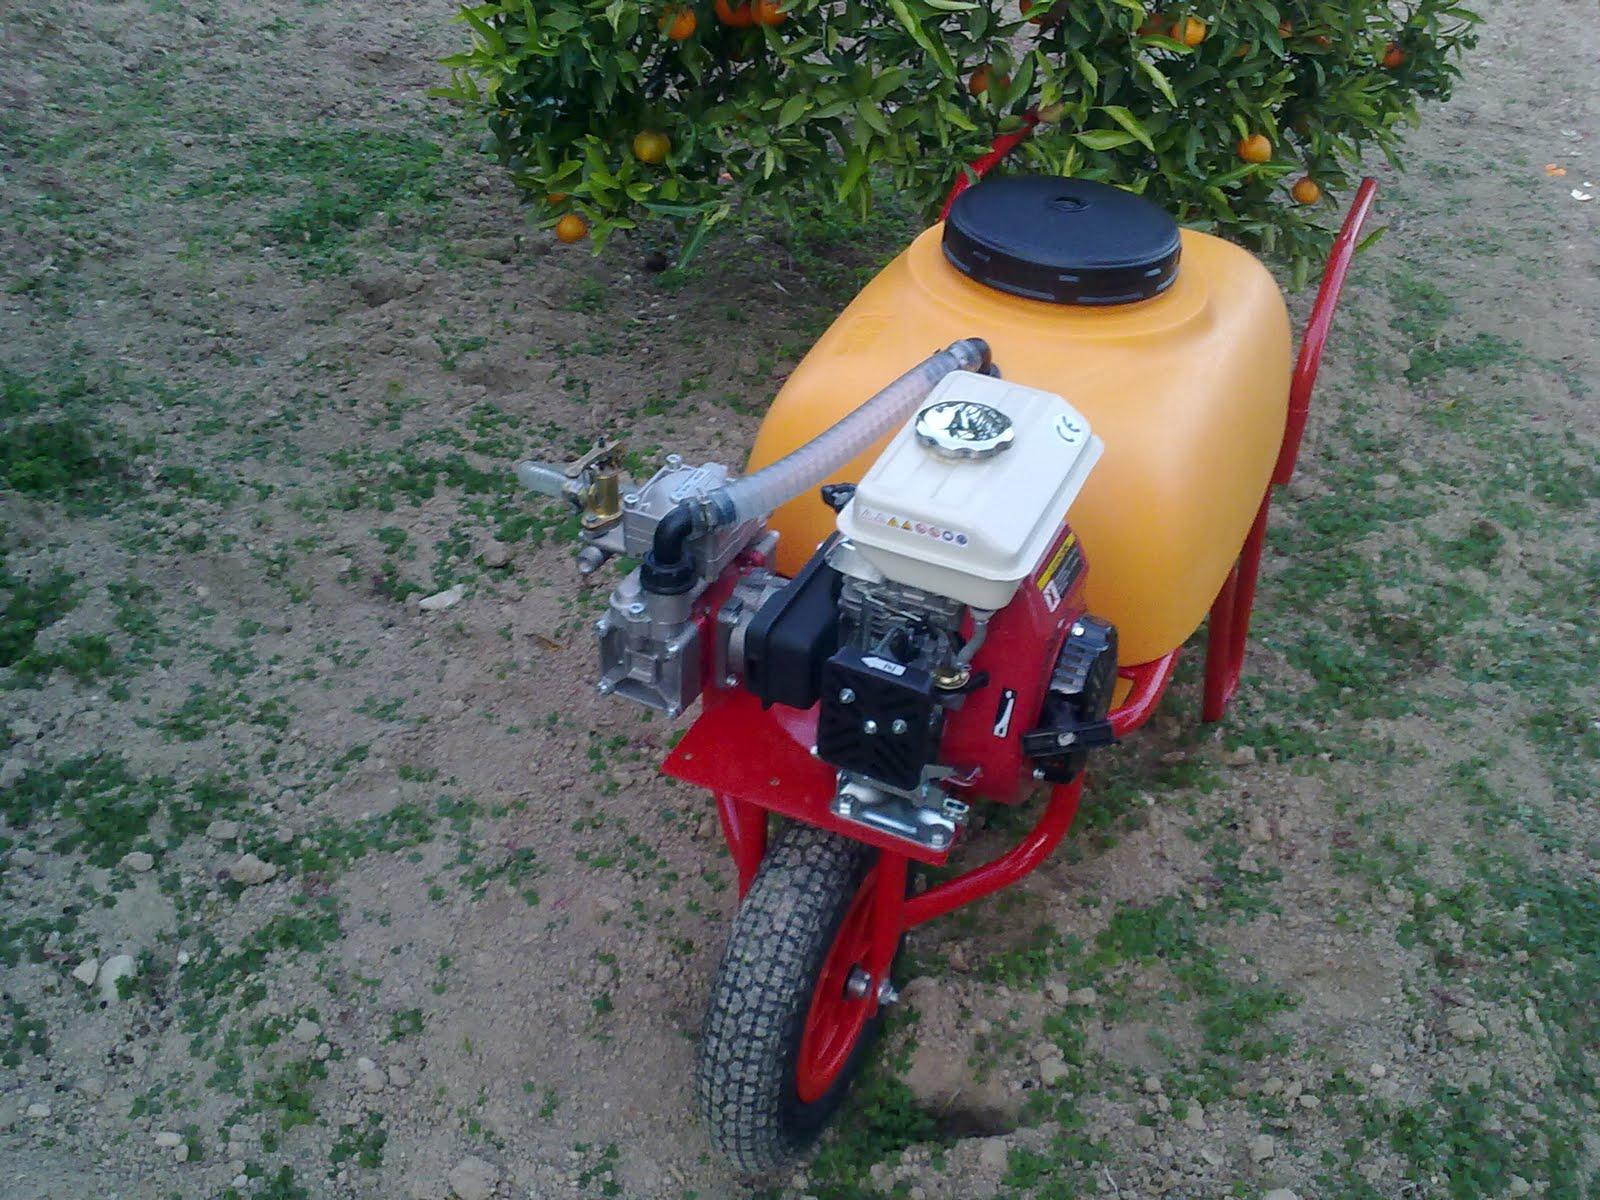 Motoazadas Murcia Telefonos 610810307 Carretilla Sulfatar